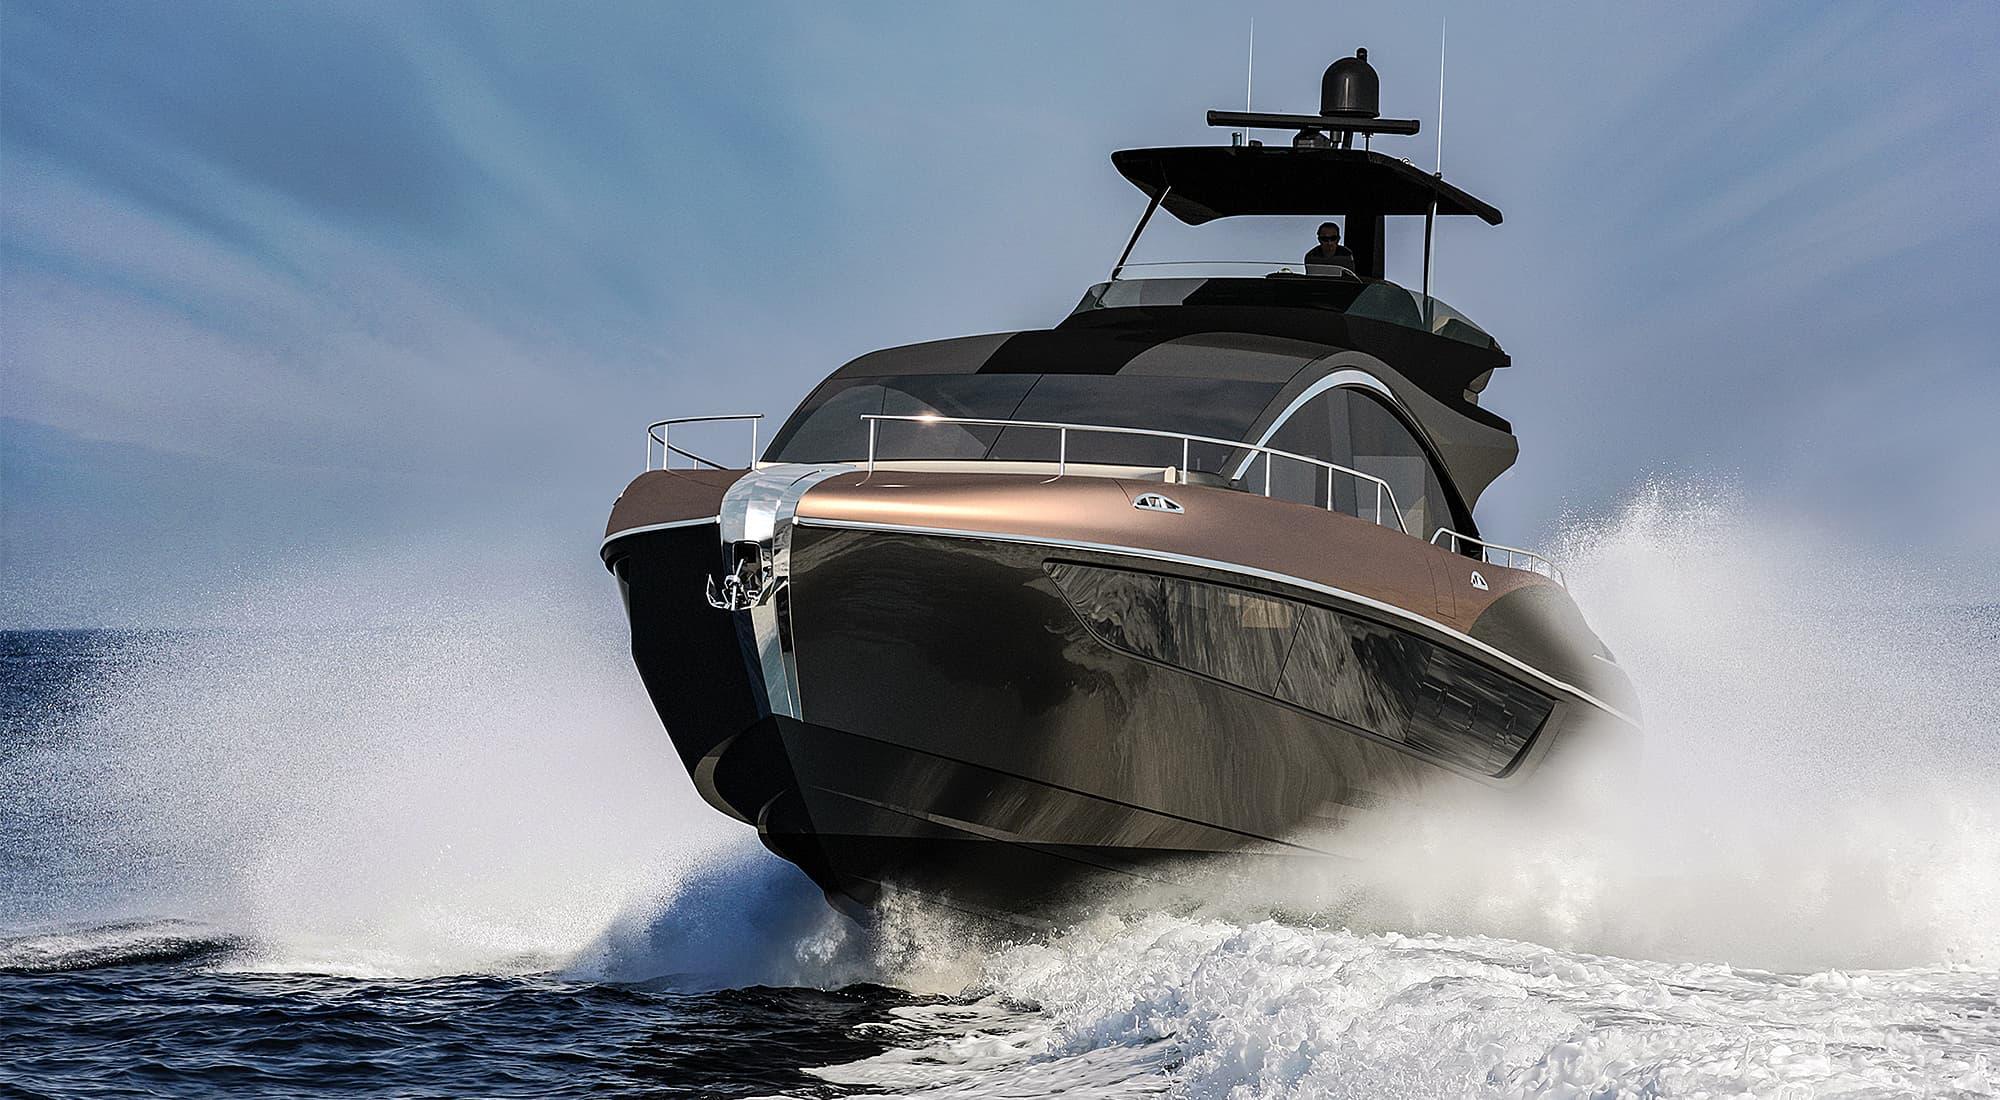 05-Lexus-yacht-2000x1100-run1_M75.jpg